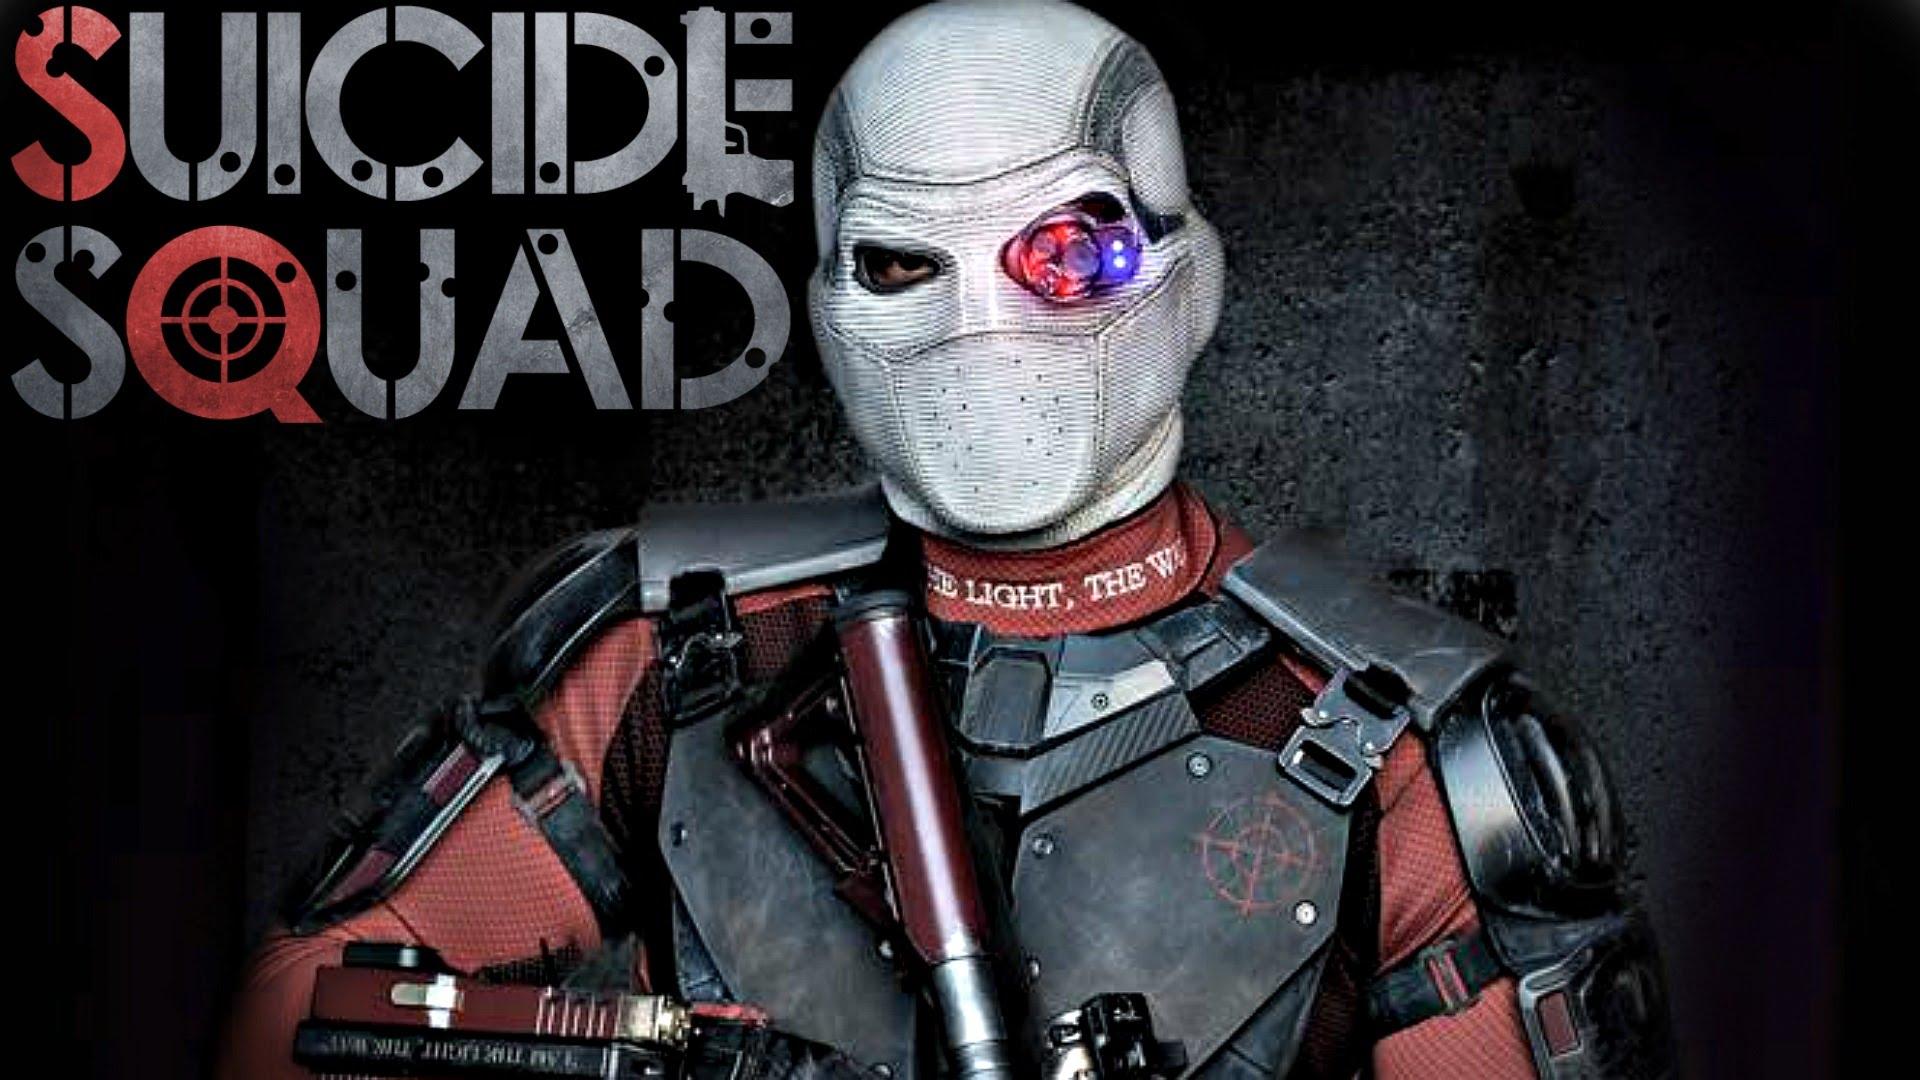 Suicide Squad Wallpaper HD